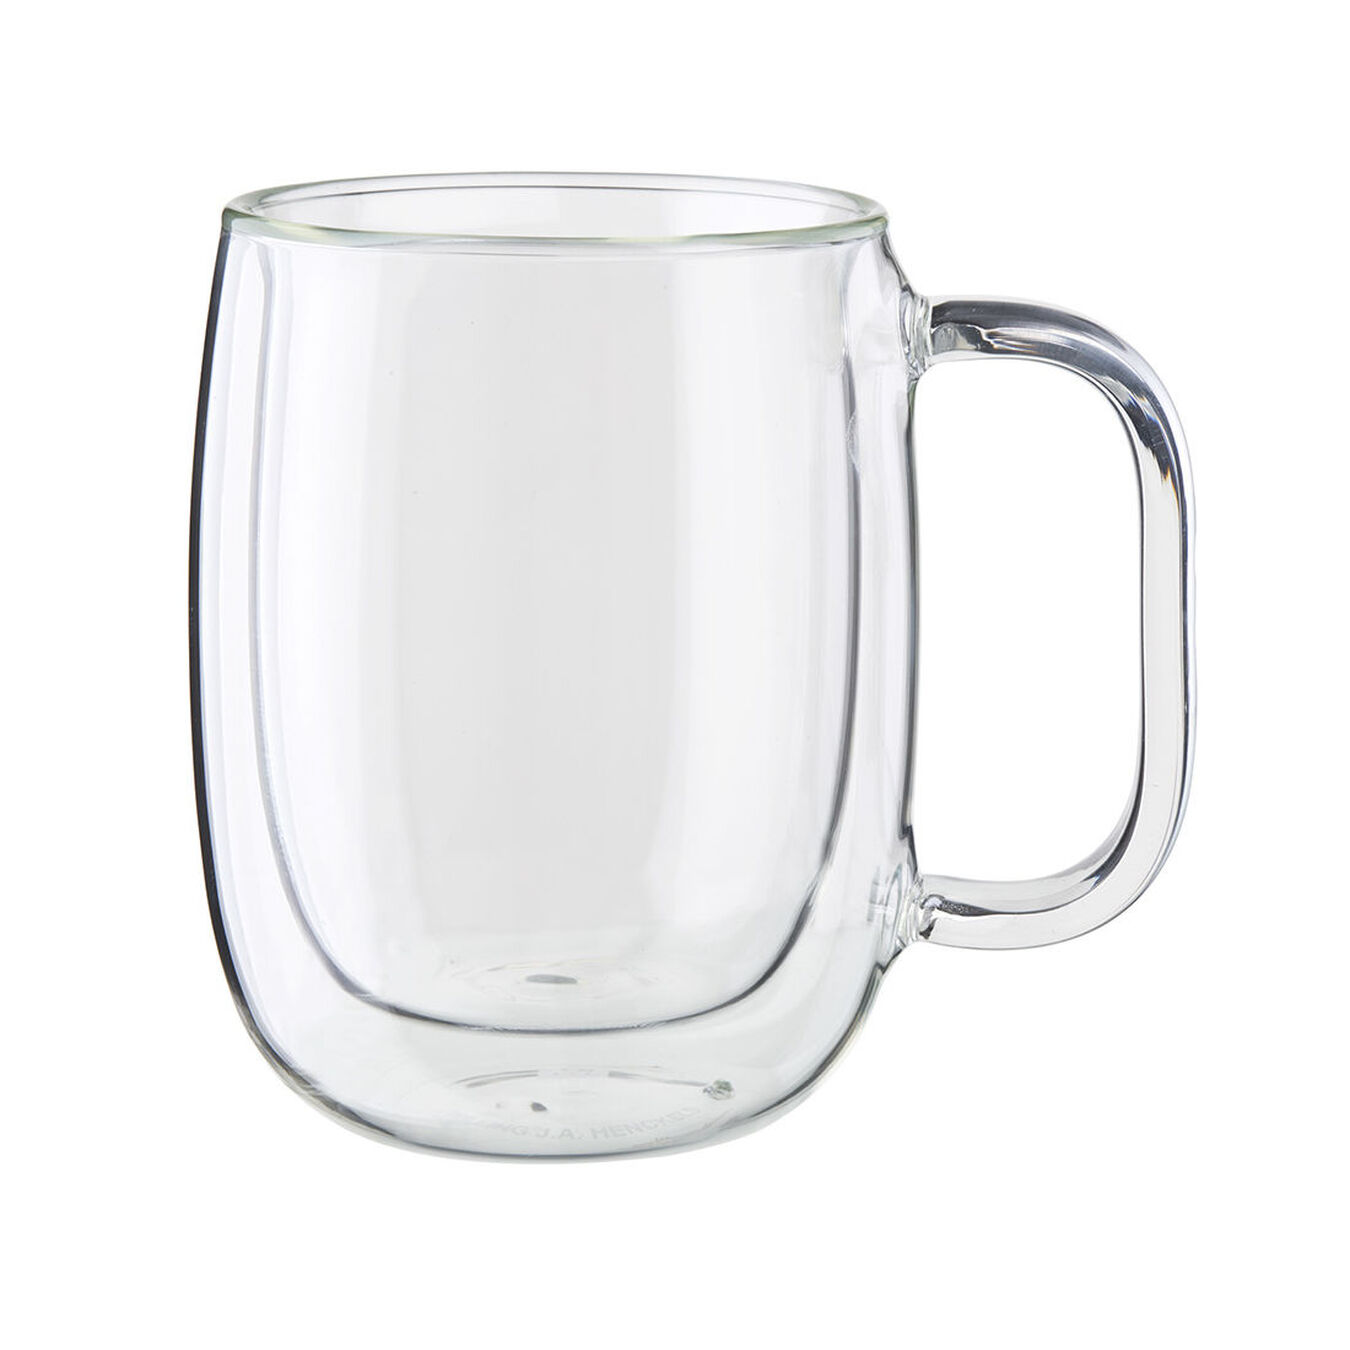 4-pc Double-Wall Glass Coffee Mug Set,,large 3